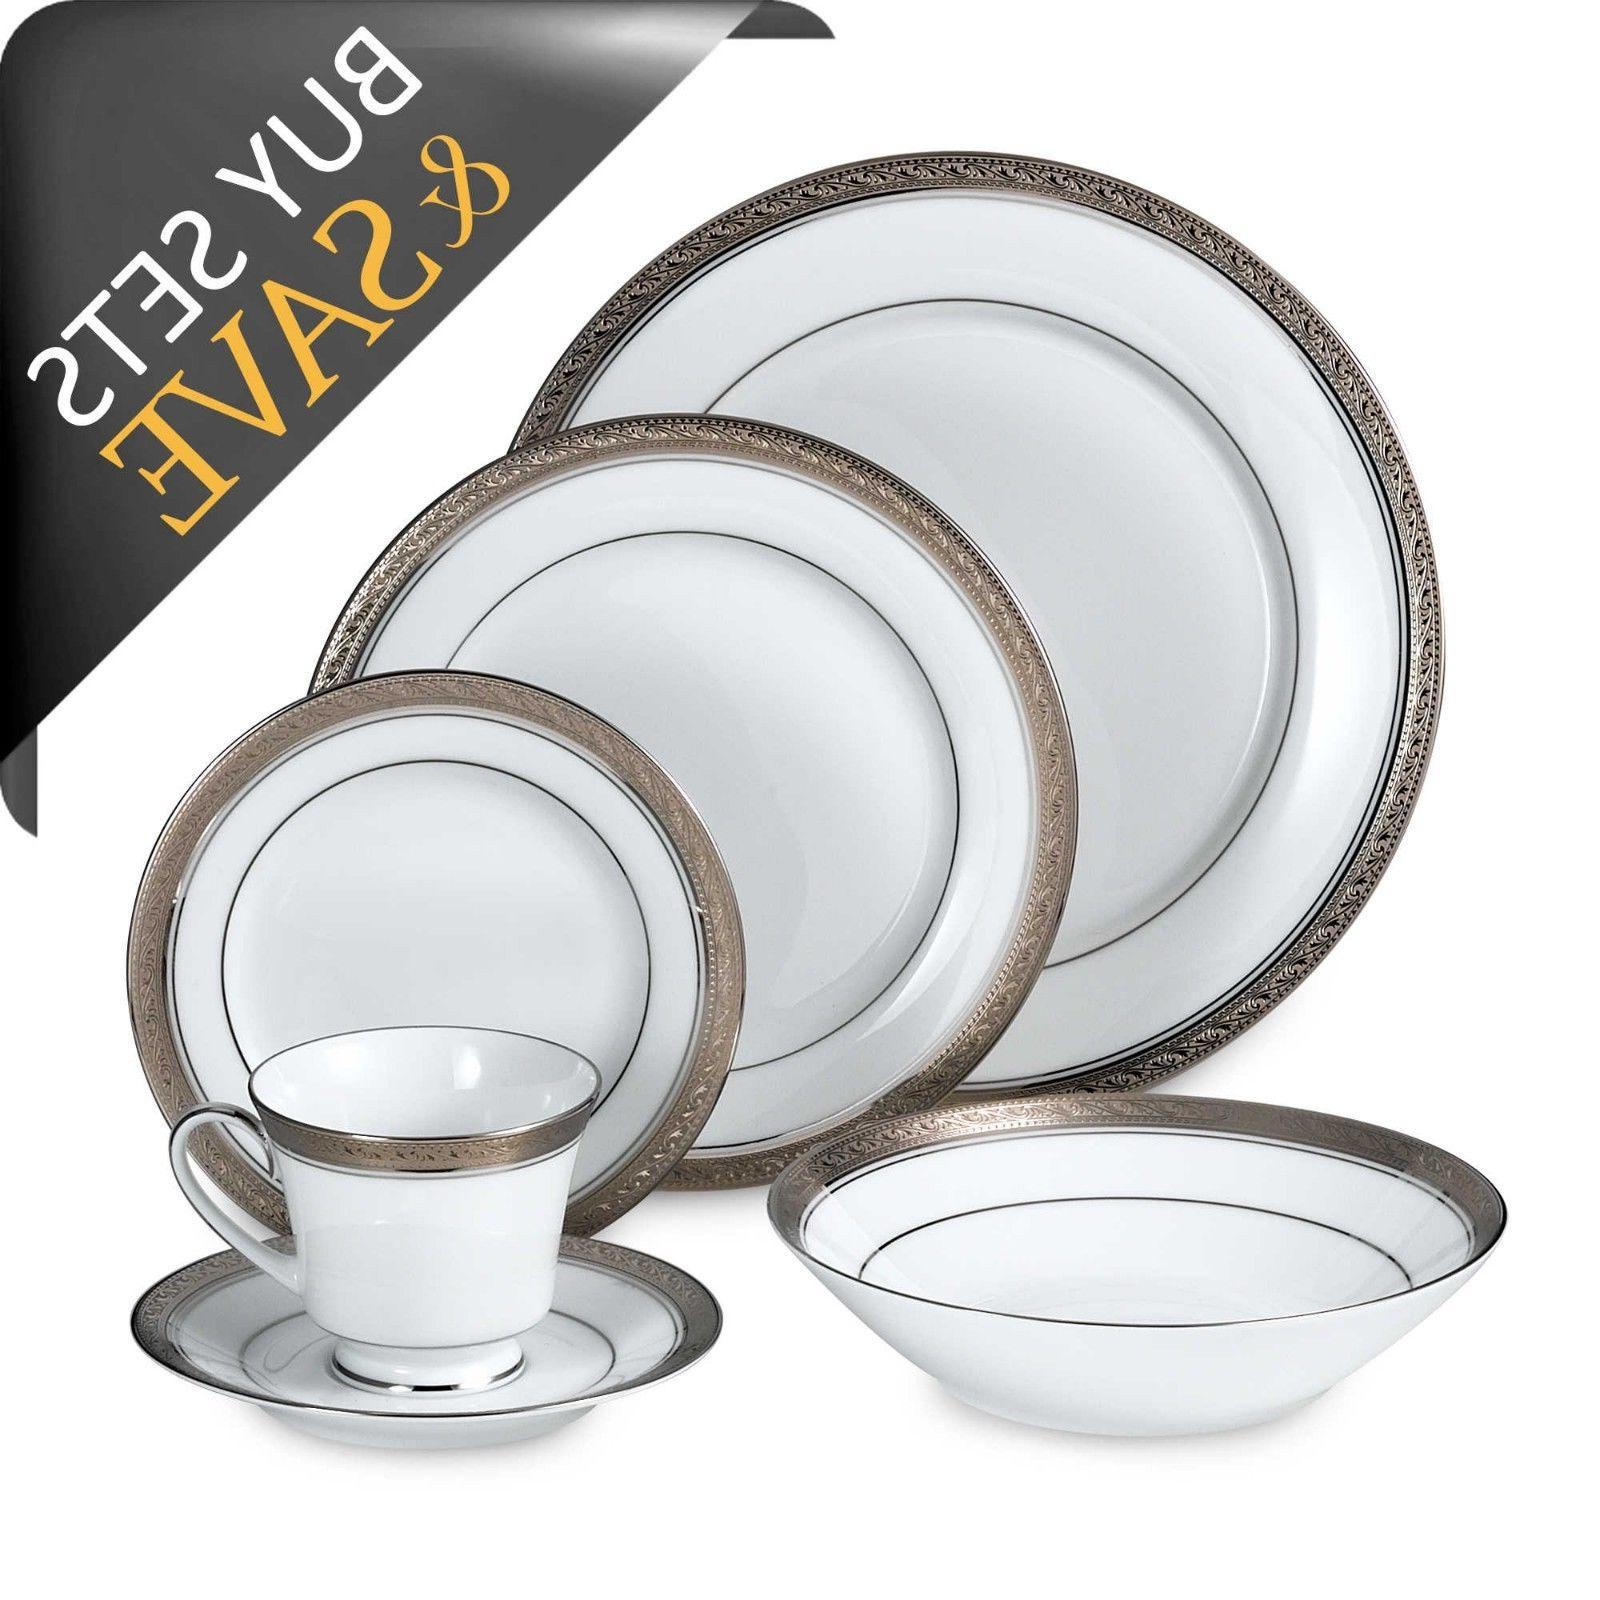 Noritake Platinum 50-piece Dinnerware Service 8 with Serve Set